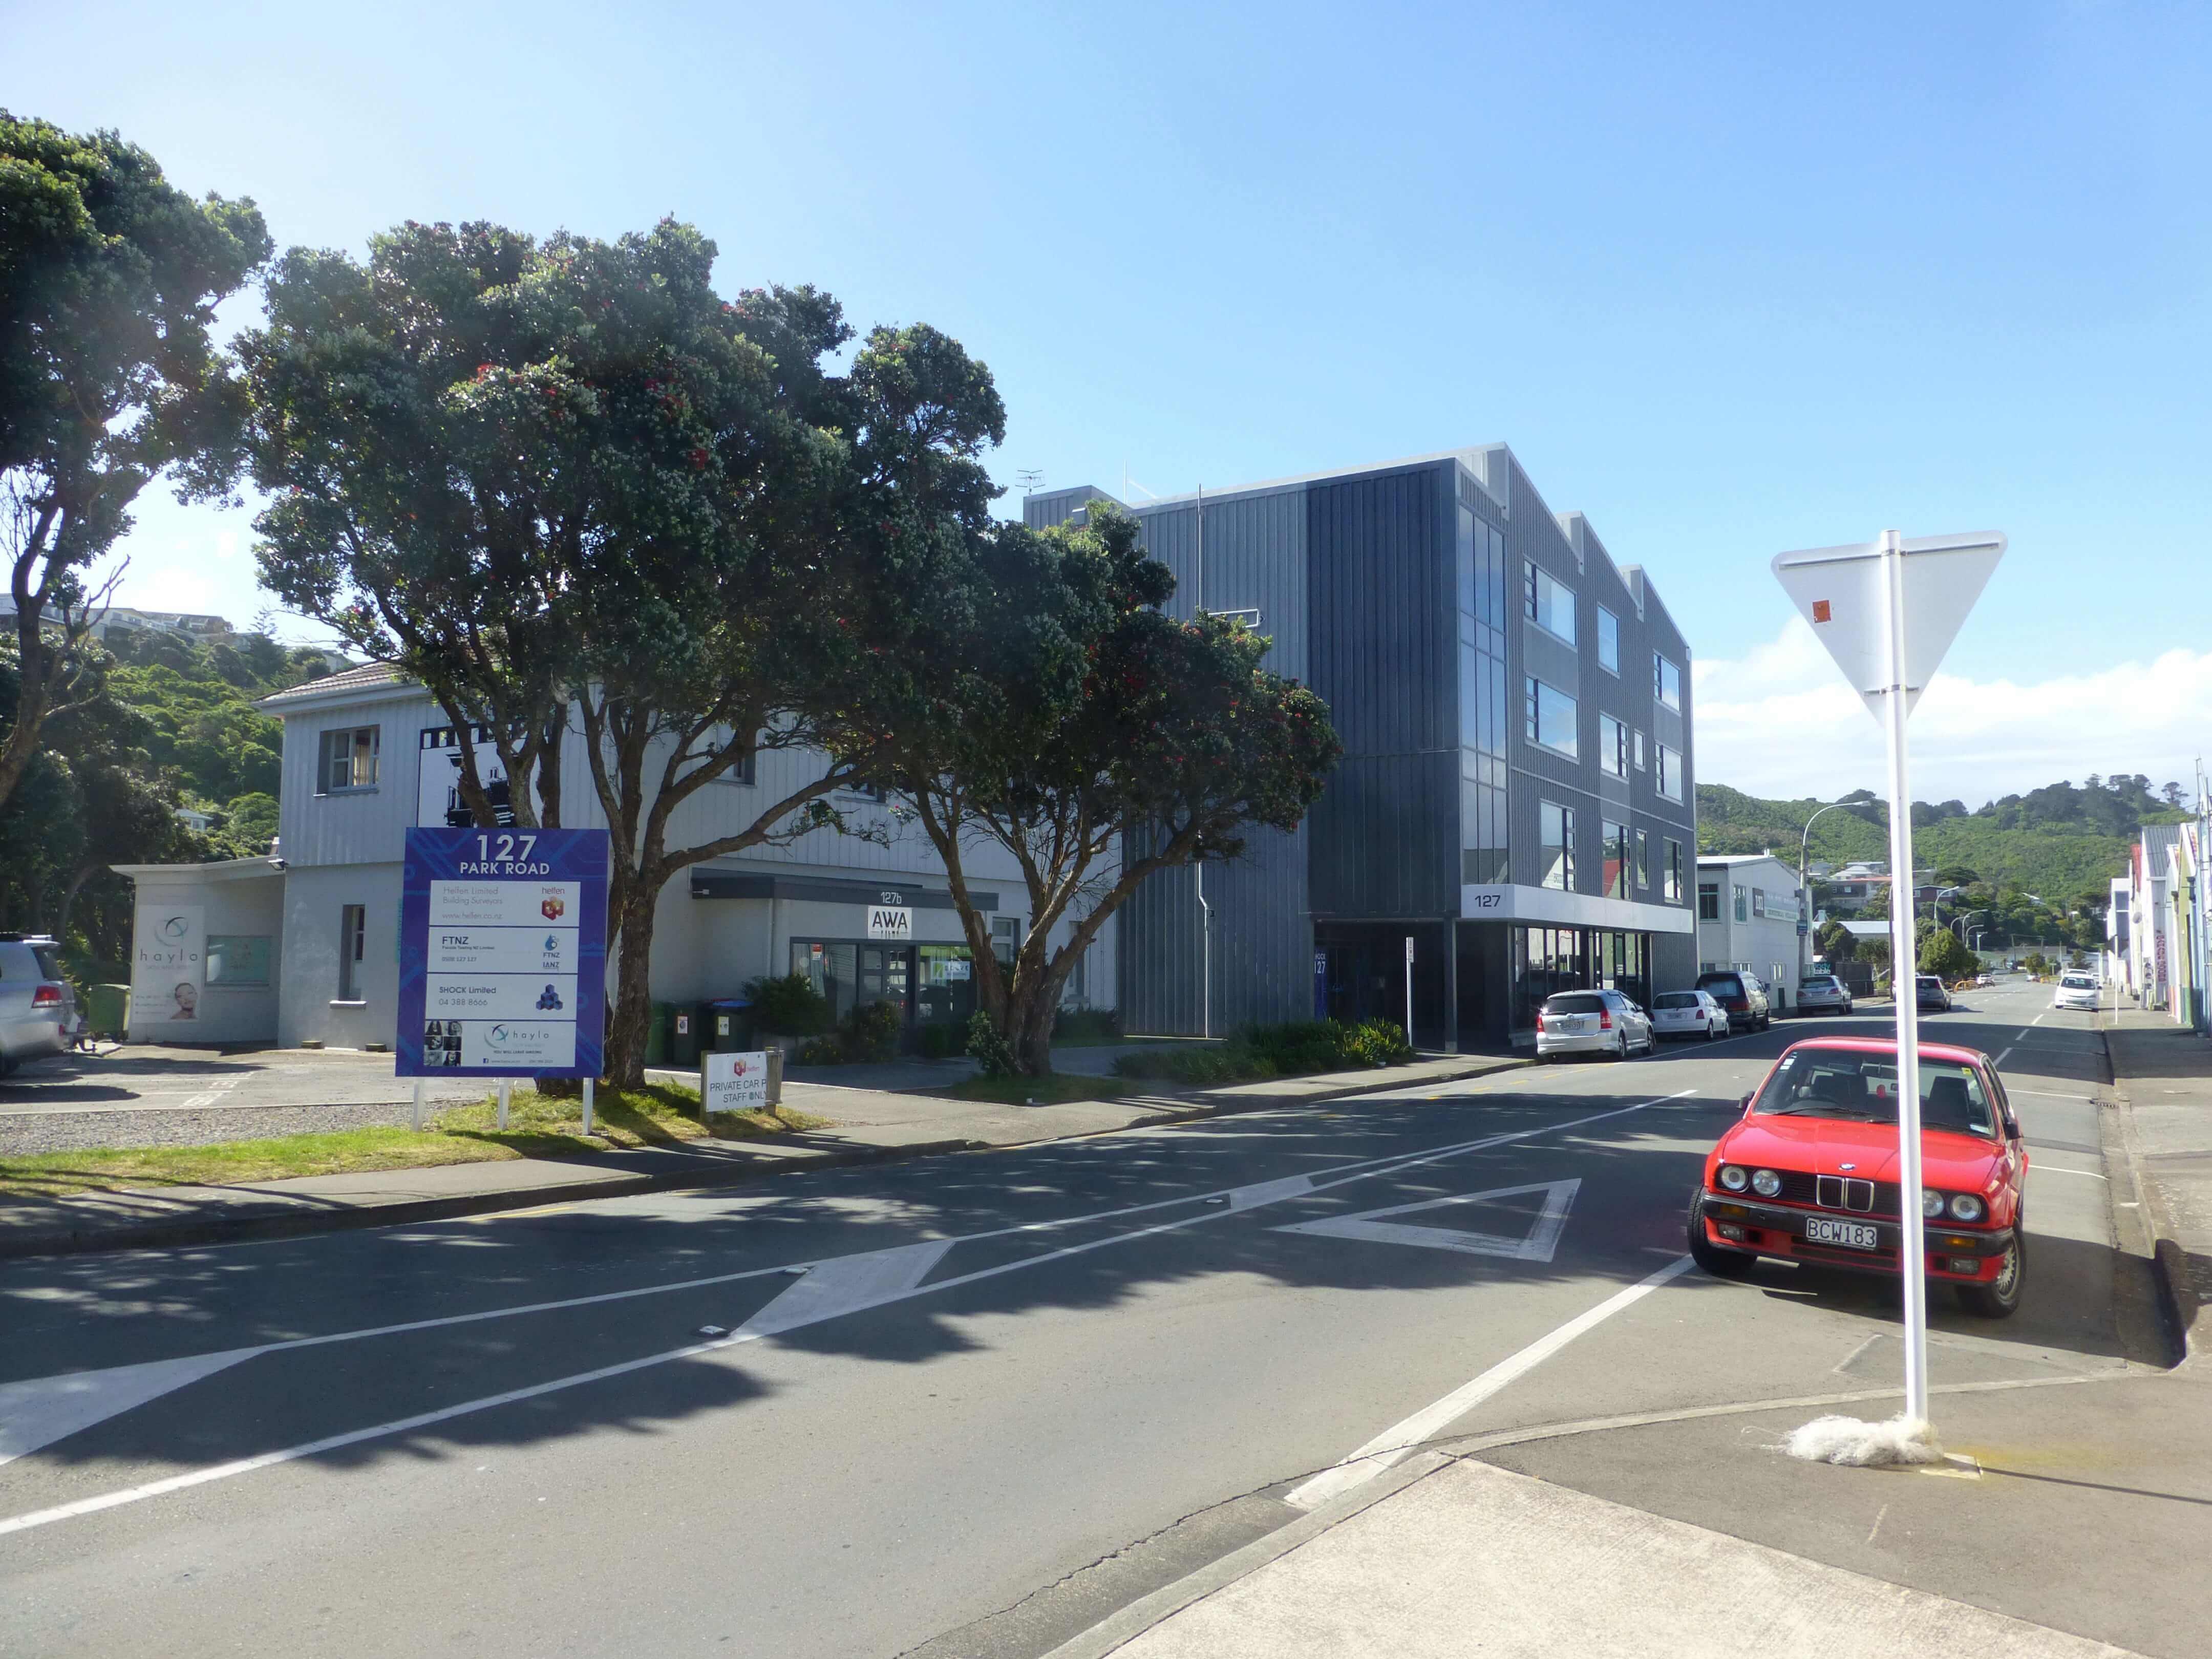 Wellington, in Miramar auf dem Weg zum Weta Shop, Weit-weg.reisen, 18